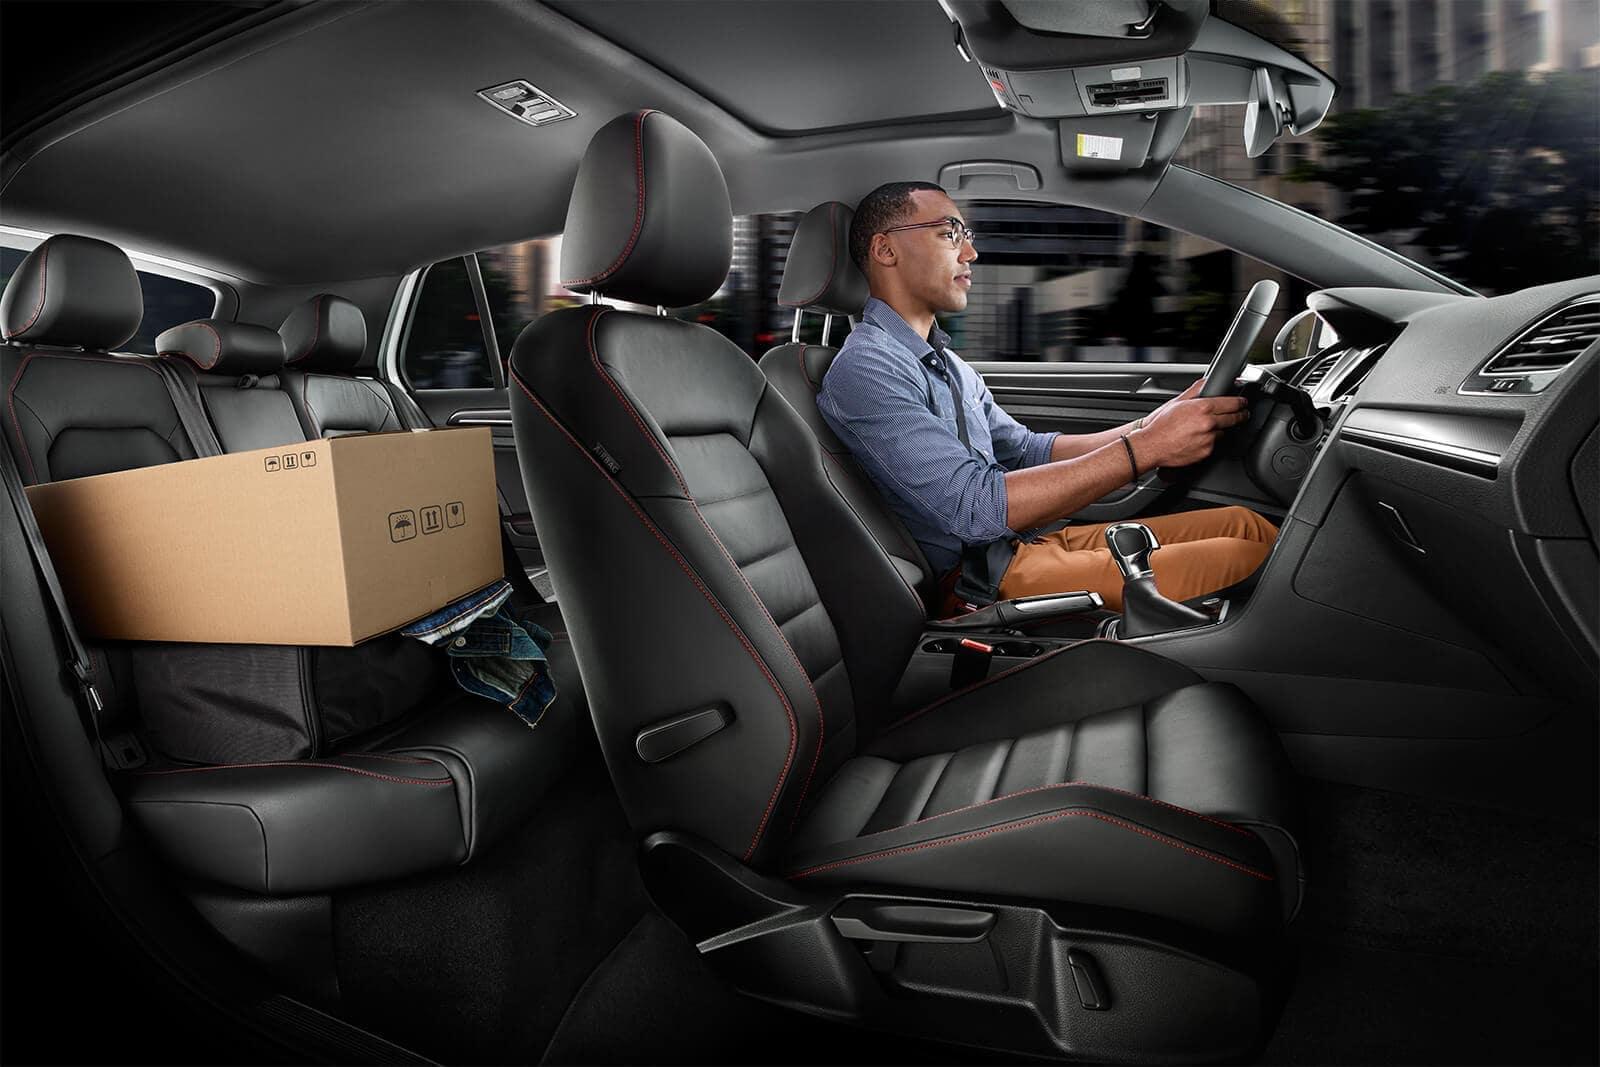 2019 VW Golf GTI Driver